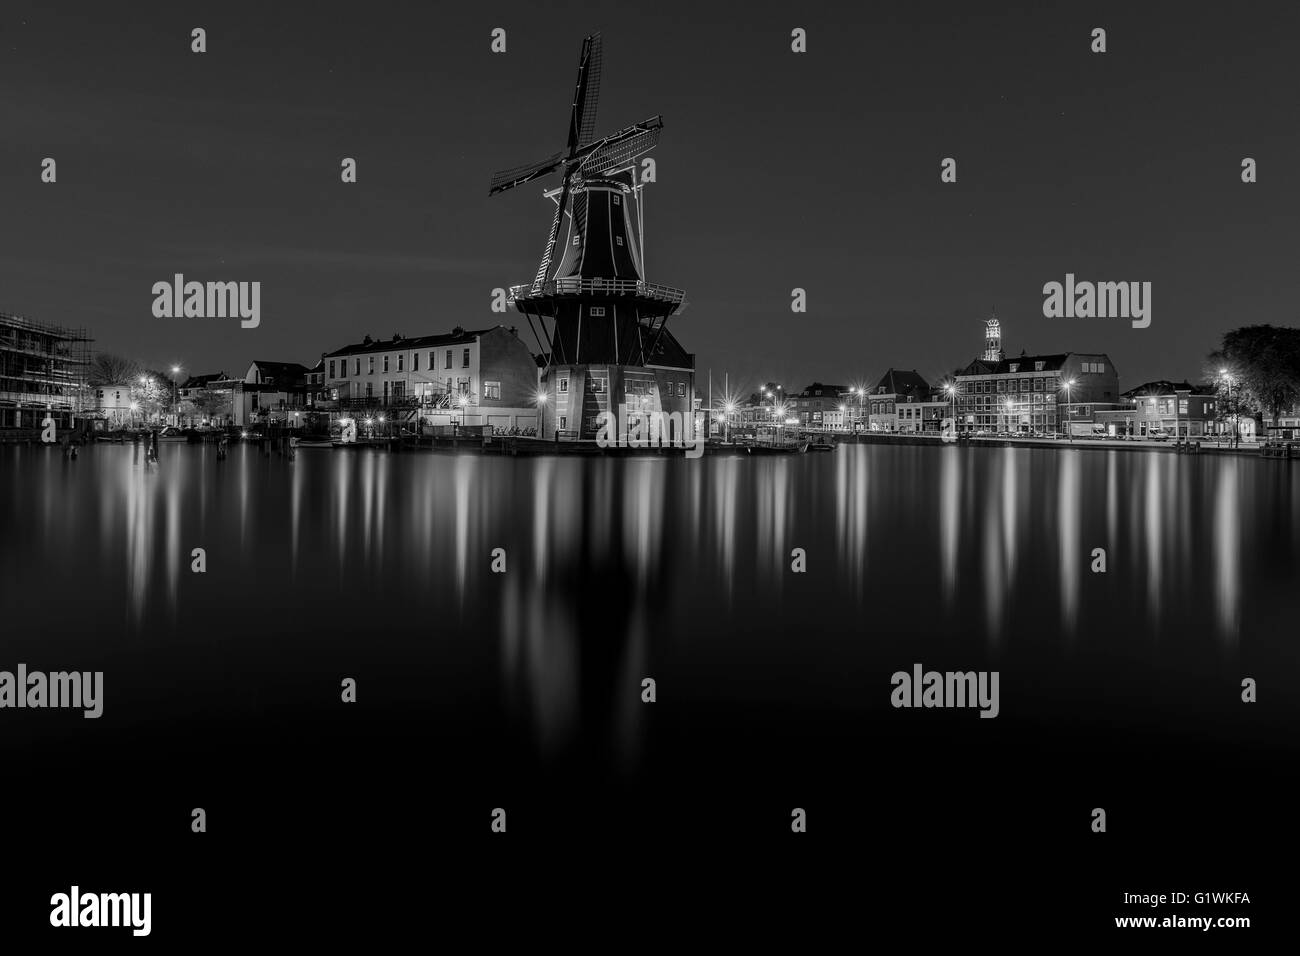 Blue hour photo of Windmill De Adriaan along river Spaarne in Haarlem (The Netherlands) - Stock Image